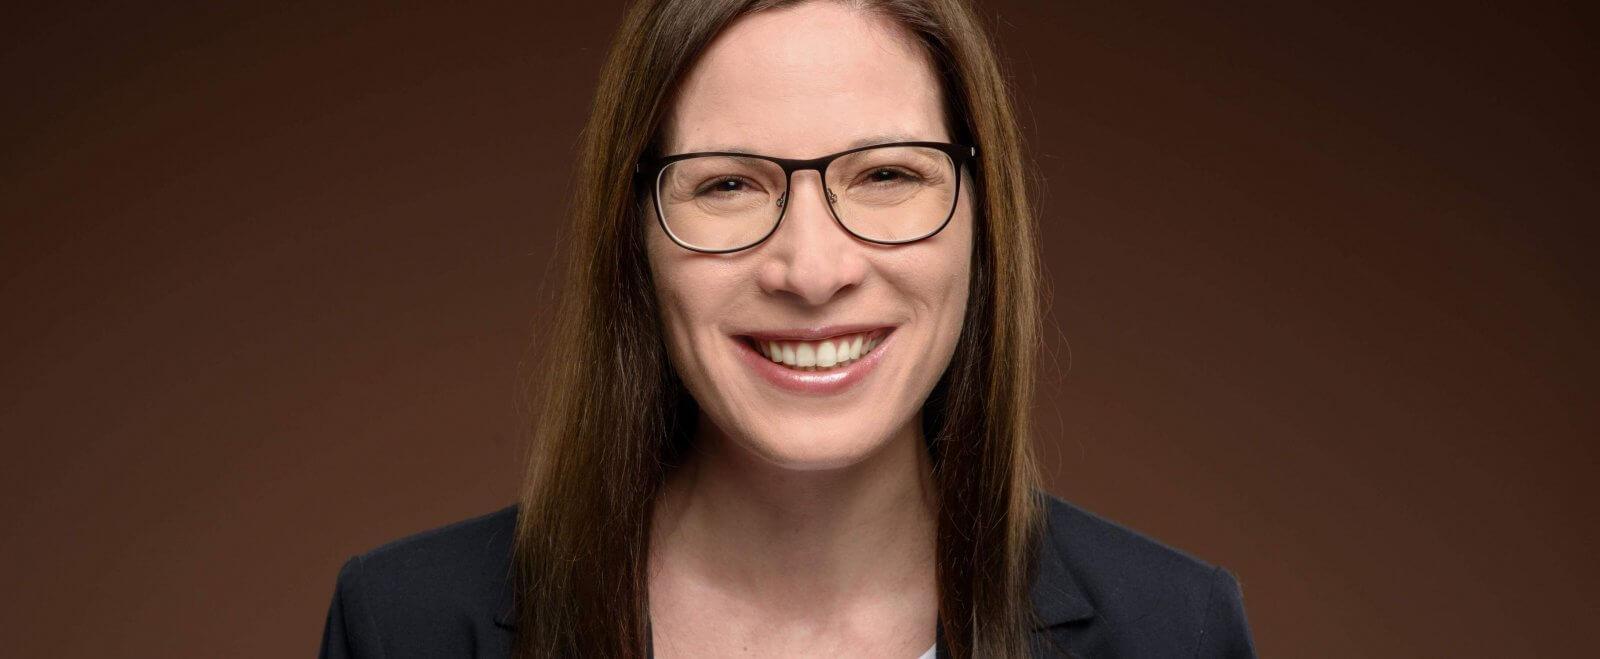 Steuerberaterin Daniela Kunz aus München